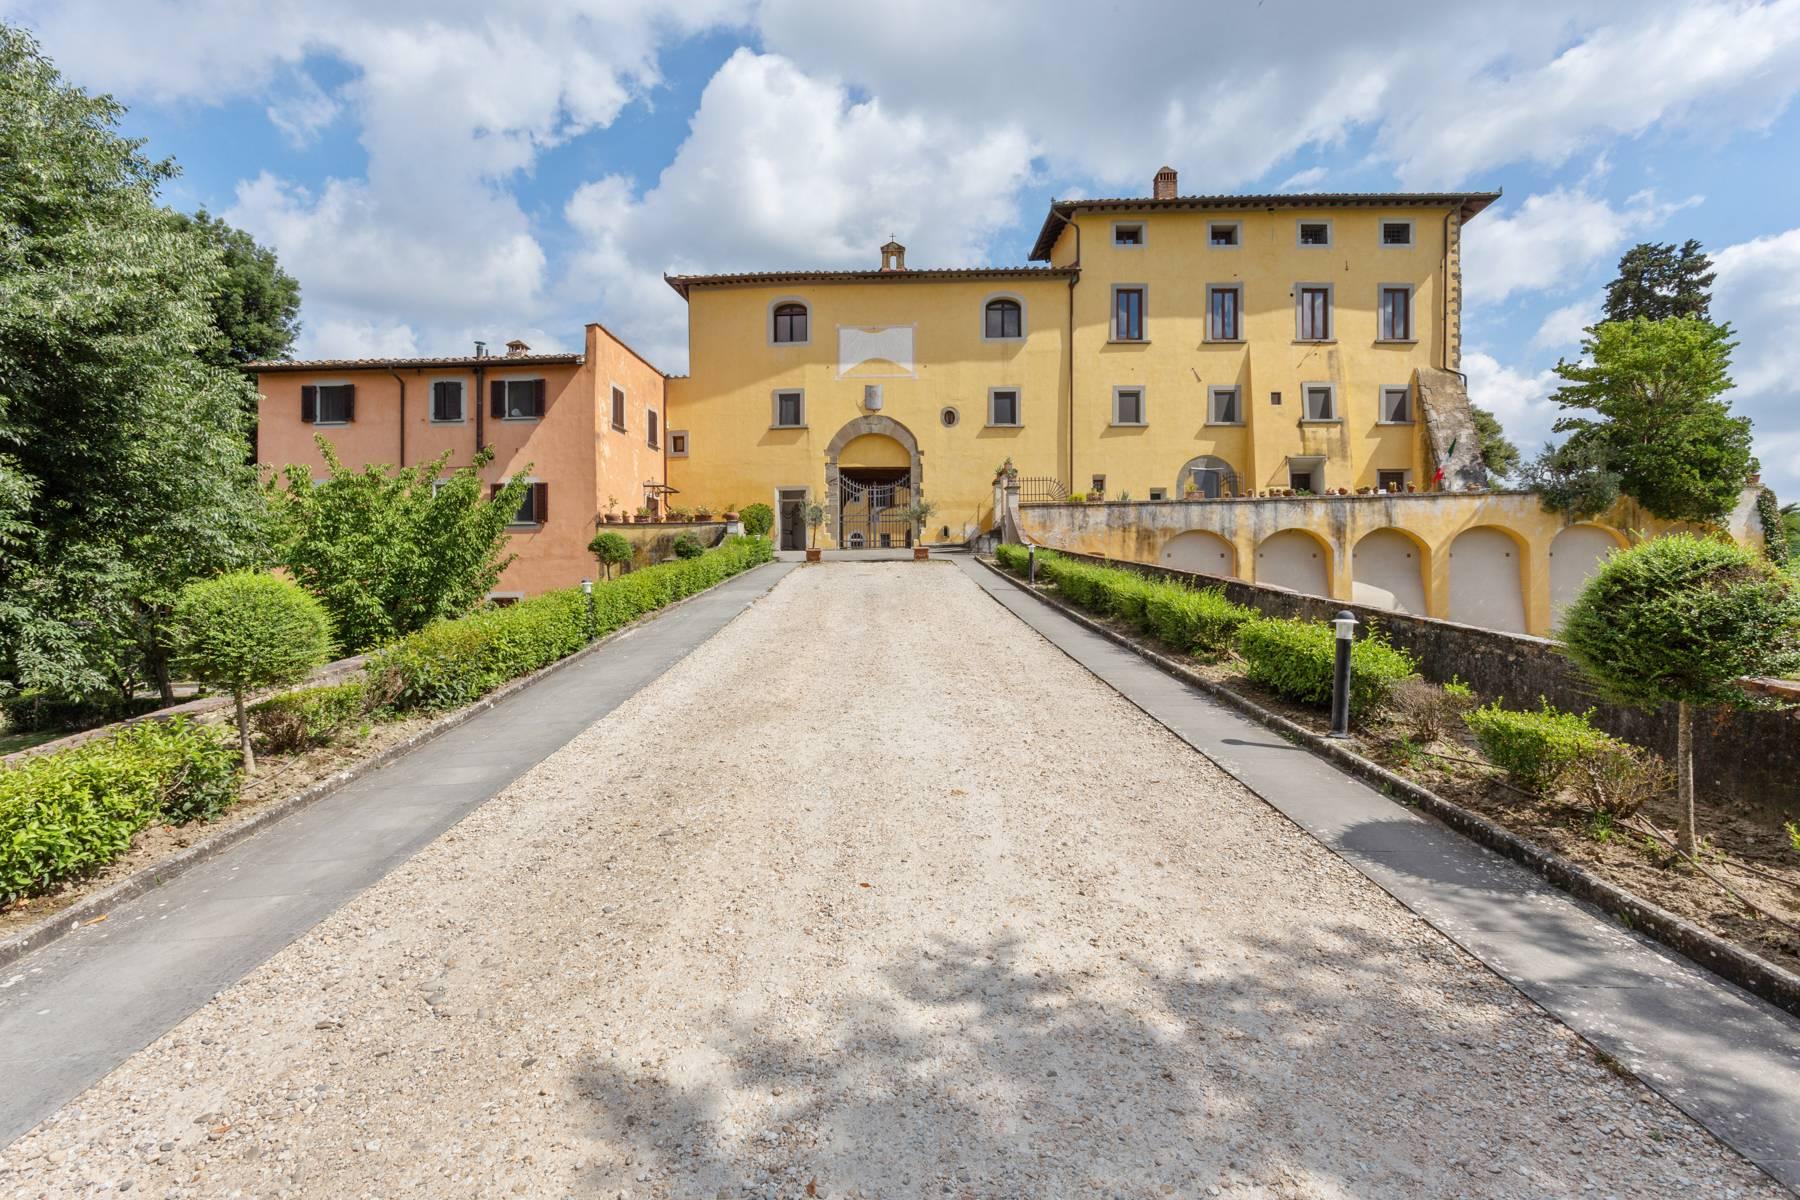 Appartamento in Vendita a Scandicci: 5 locali, 170 mq - Foto 19